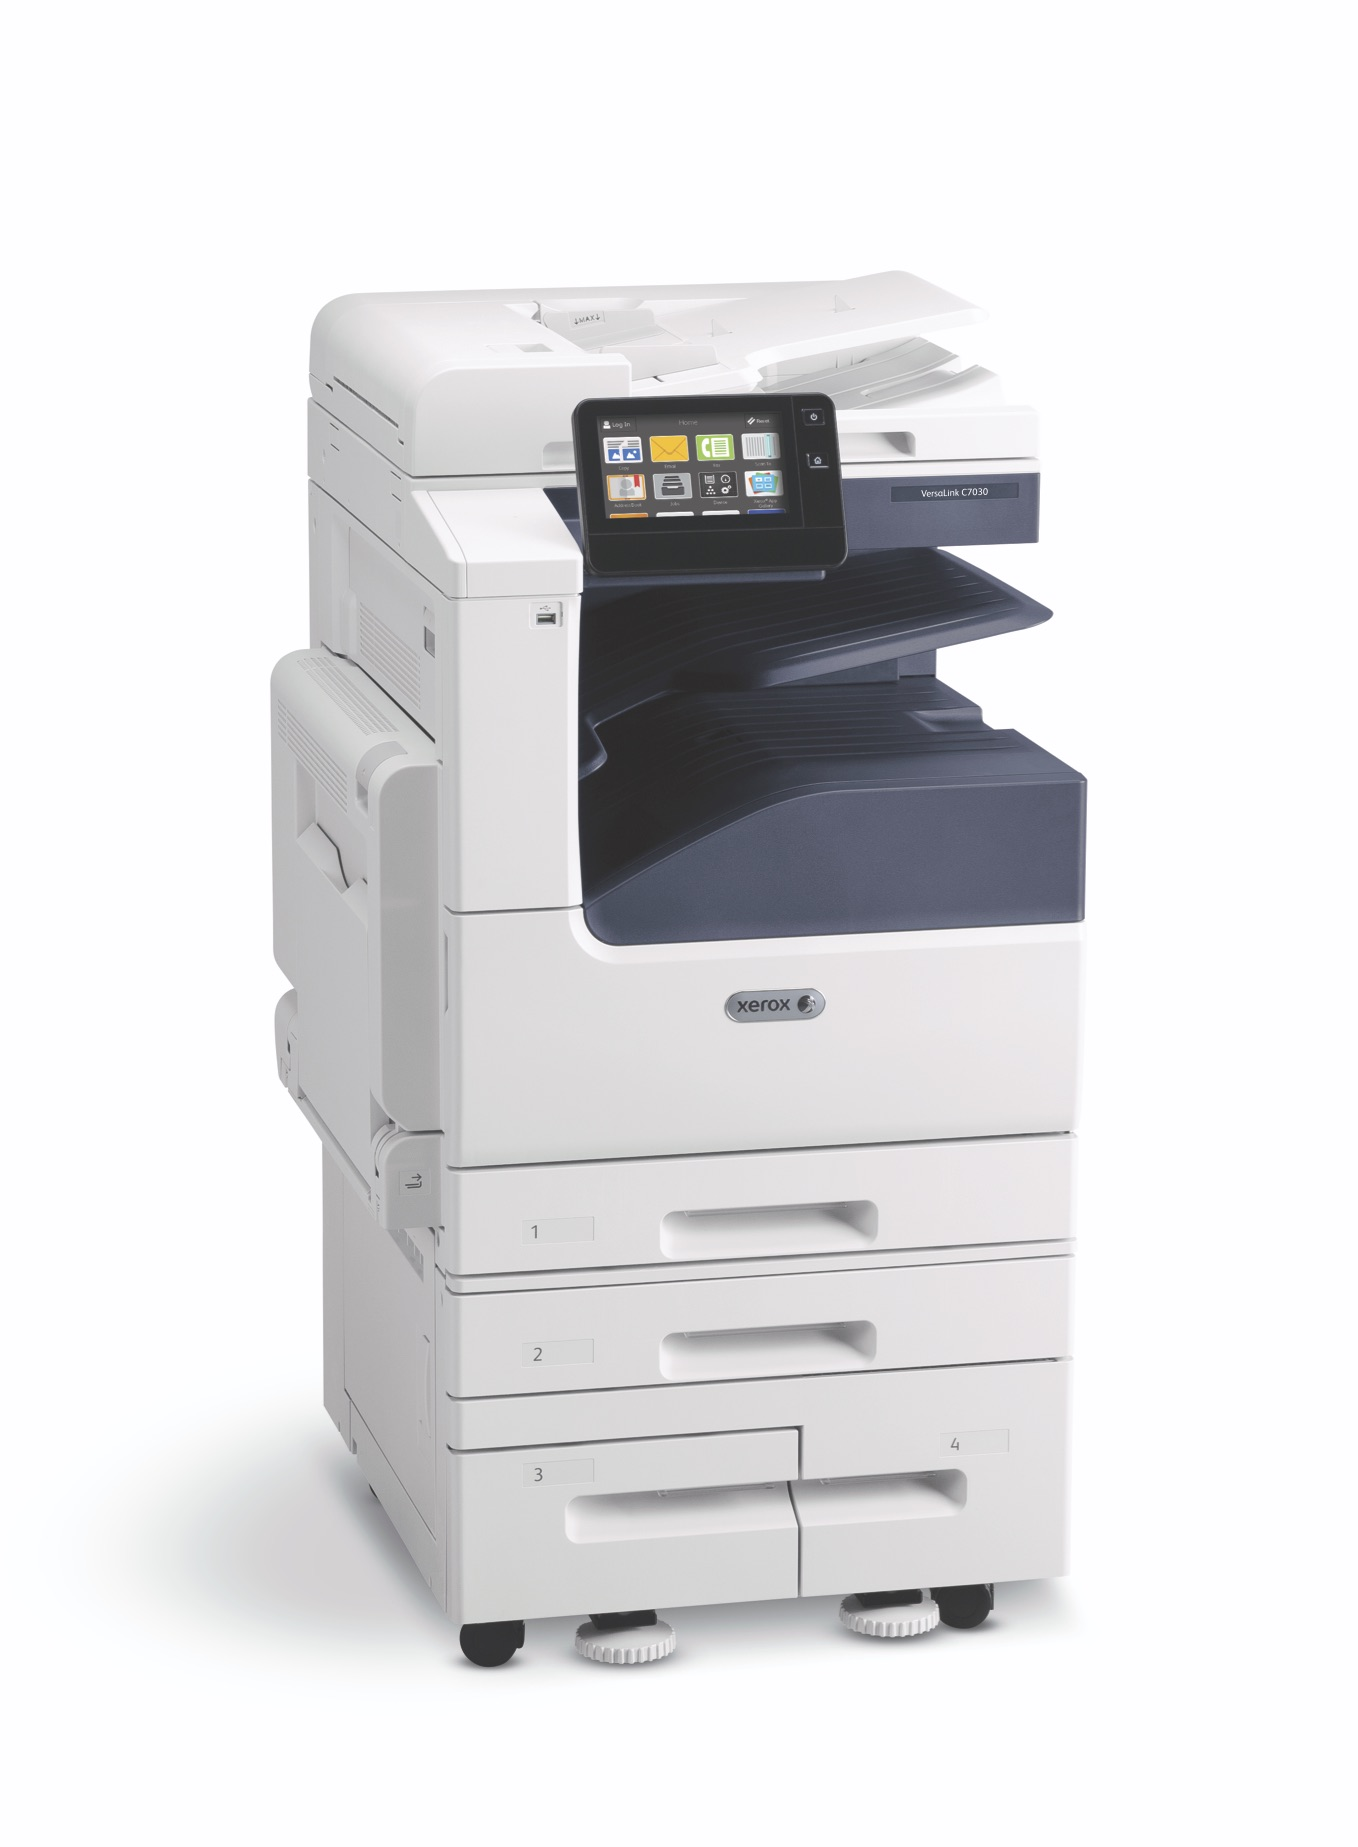 Xerox VersaLink C7020 / C7025 / C7030 Multifunction Printer